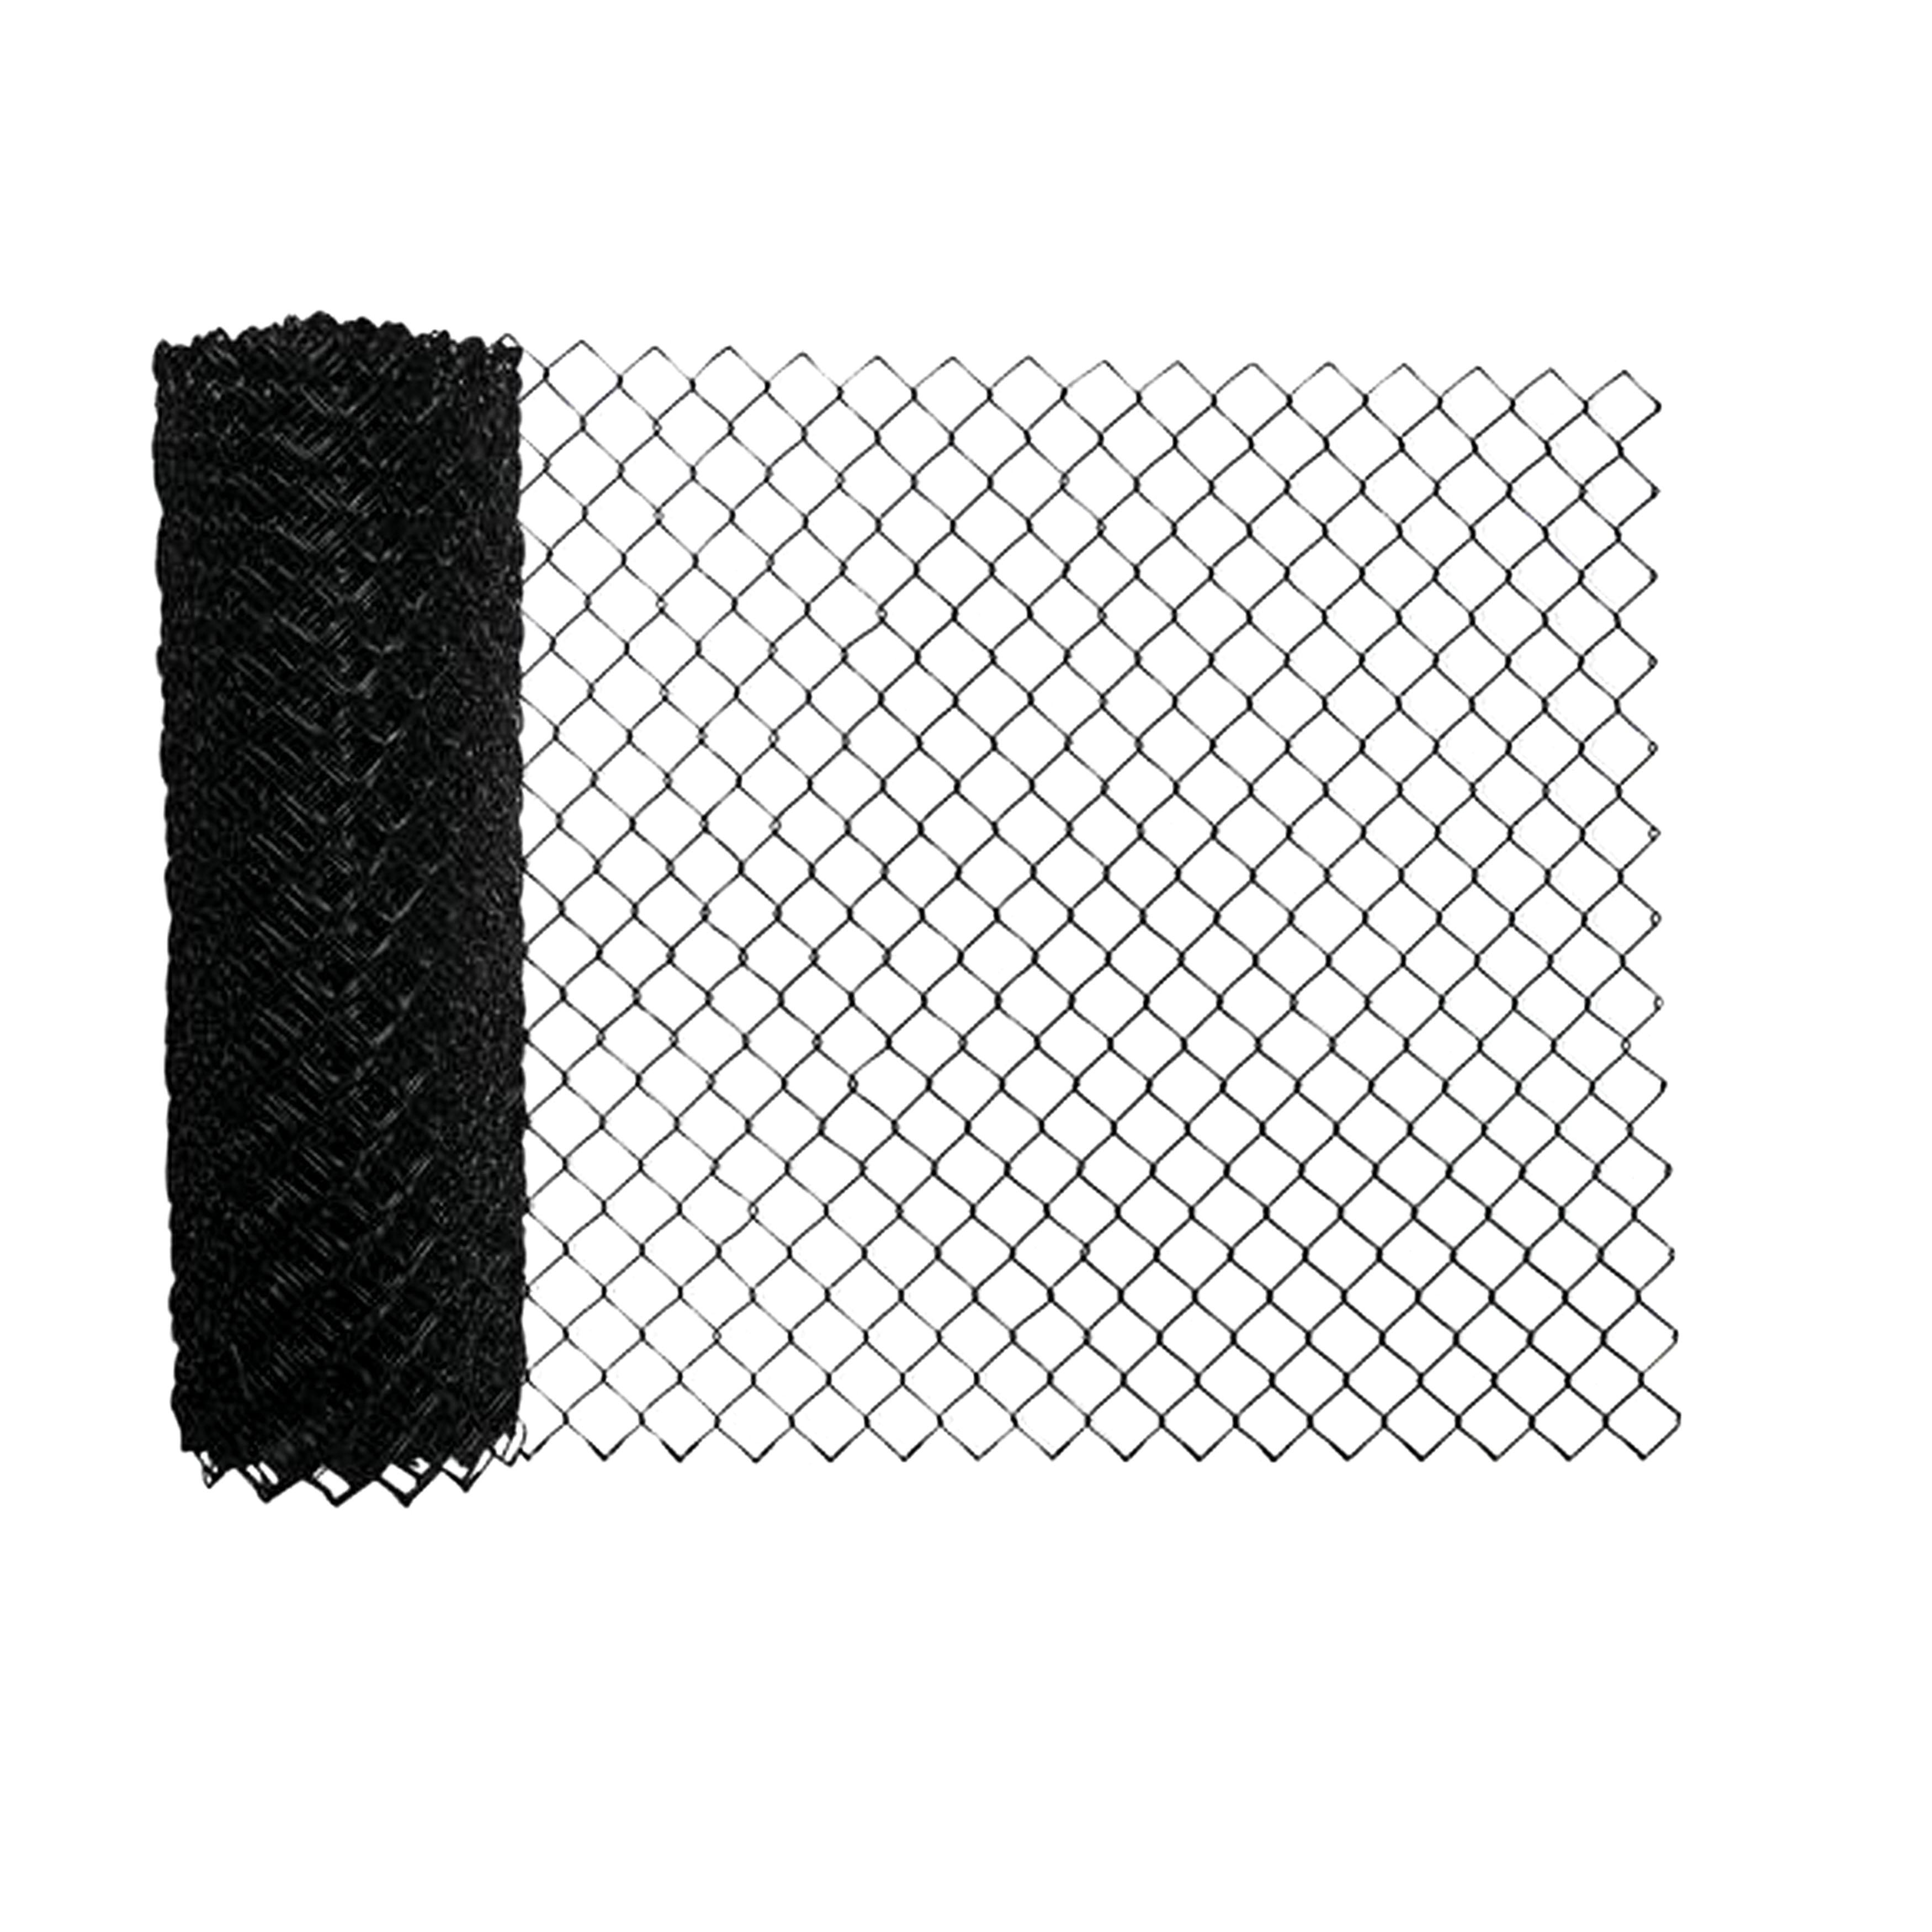 Aleko Clfb10g6x50 Galvanized Steel Chain Link Fence Fabric 10 Gauge 6 X 50 Feet Black Walmart Canada